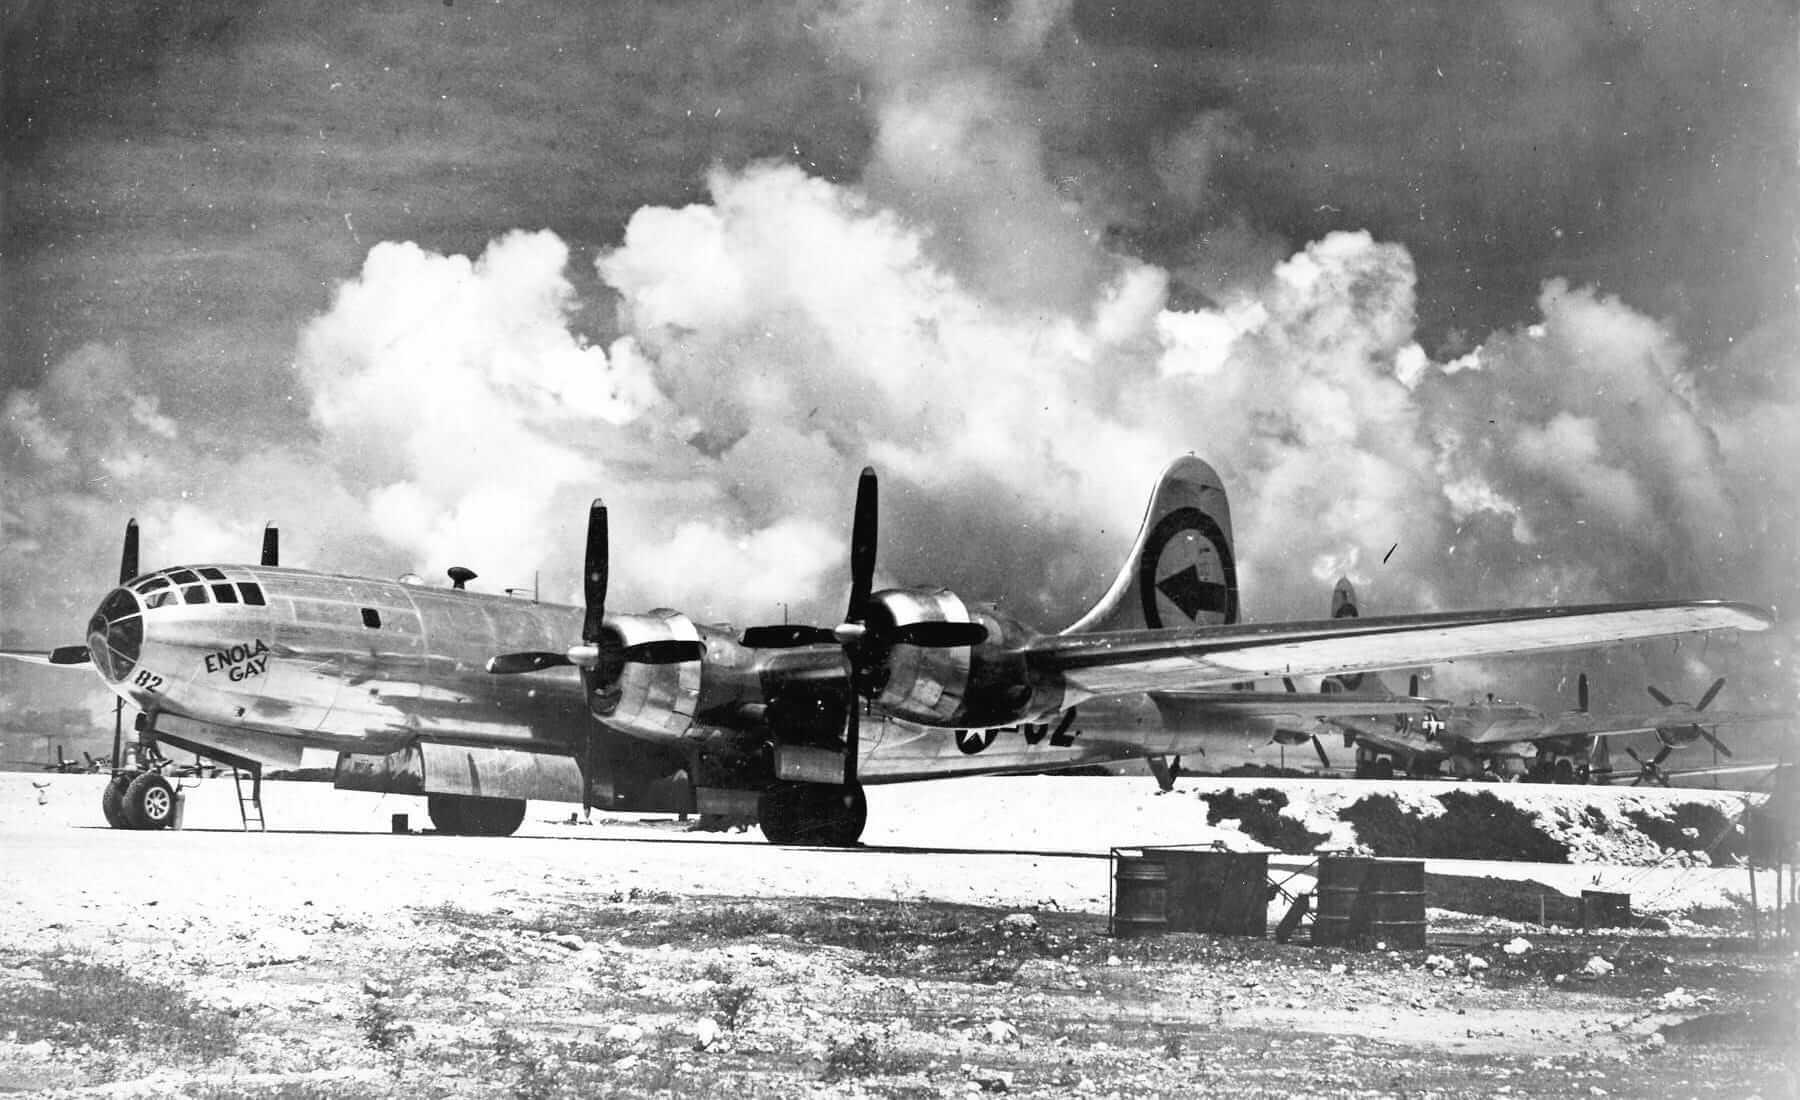 Bombardero Enola Gay, encargado de lanzar la bomba nuclear sobre Hiroshima